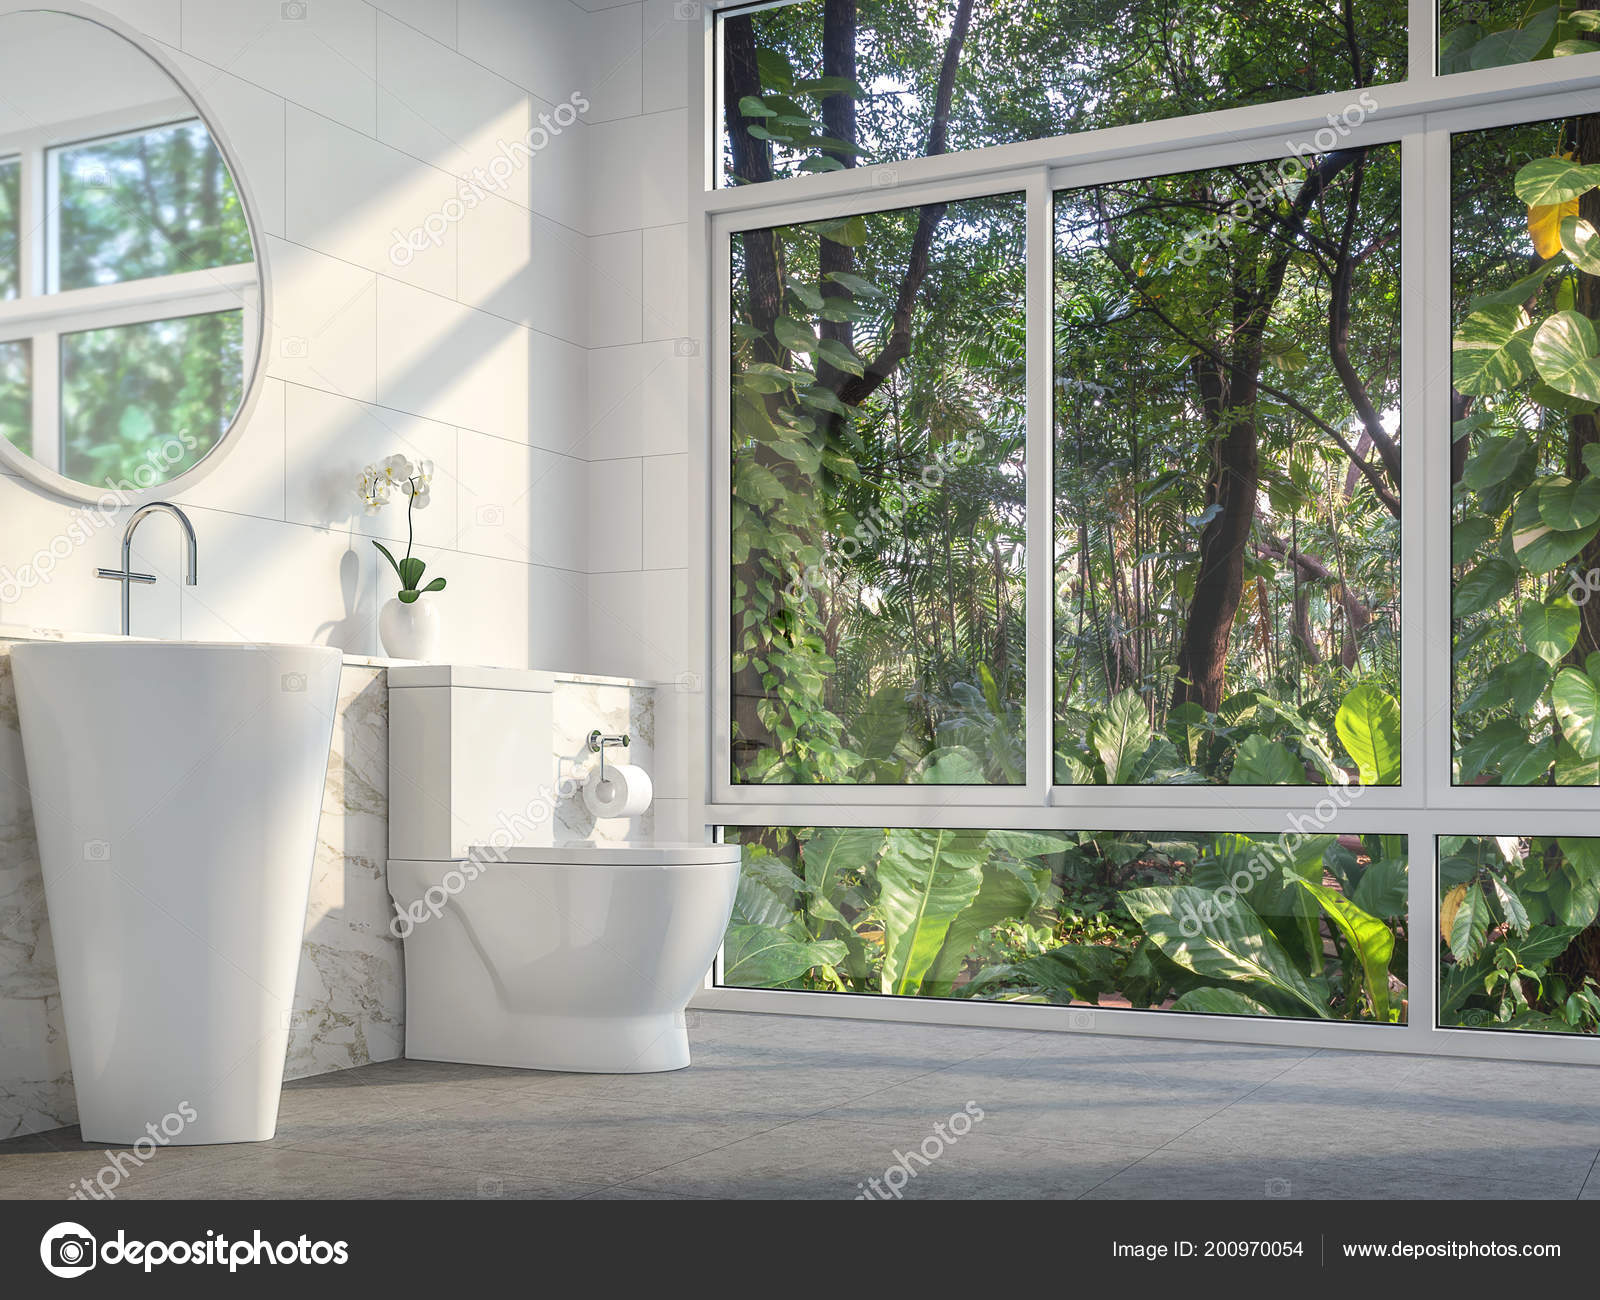 . Modern Toilet Nature View Render Concrete Tile Floor Room Has